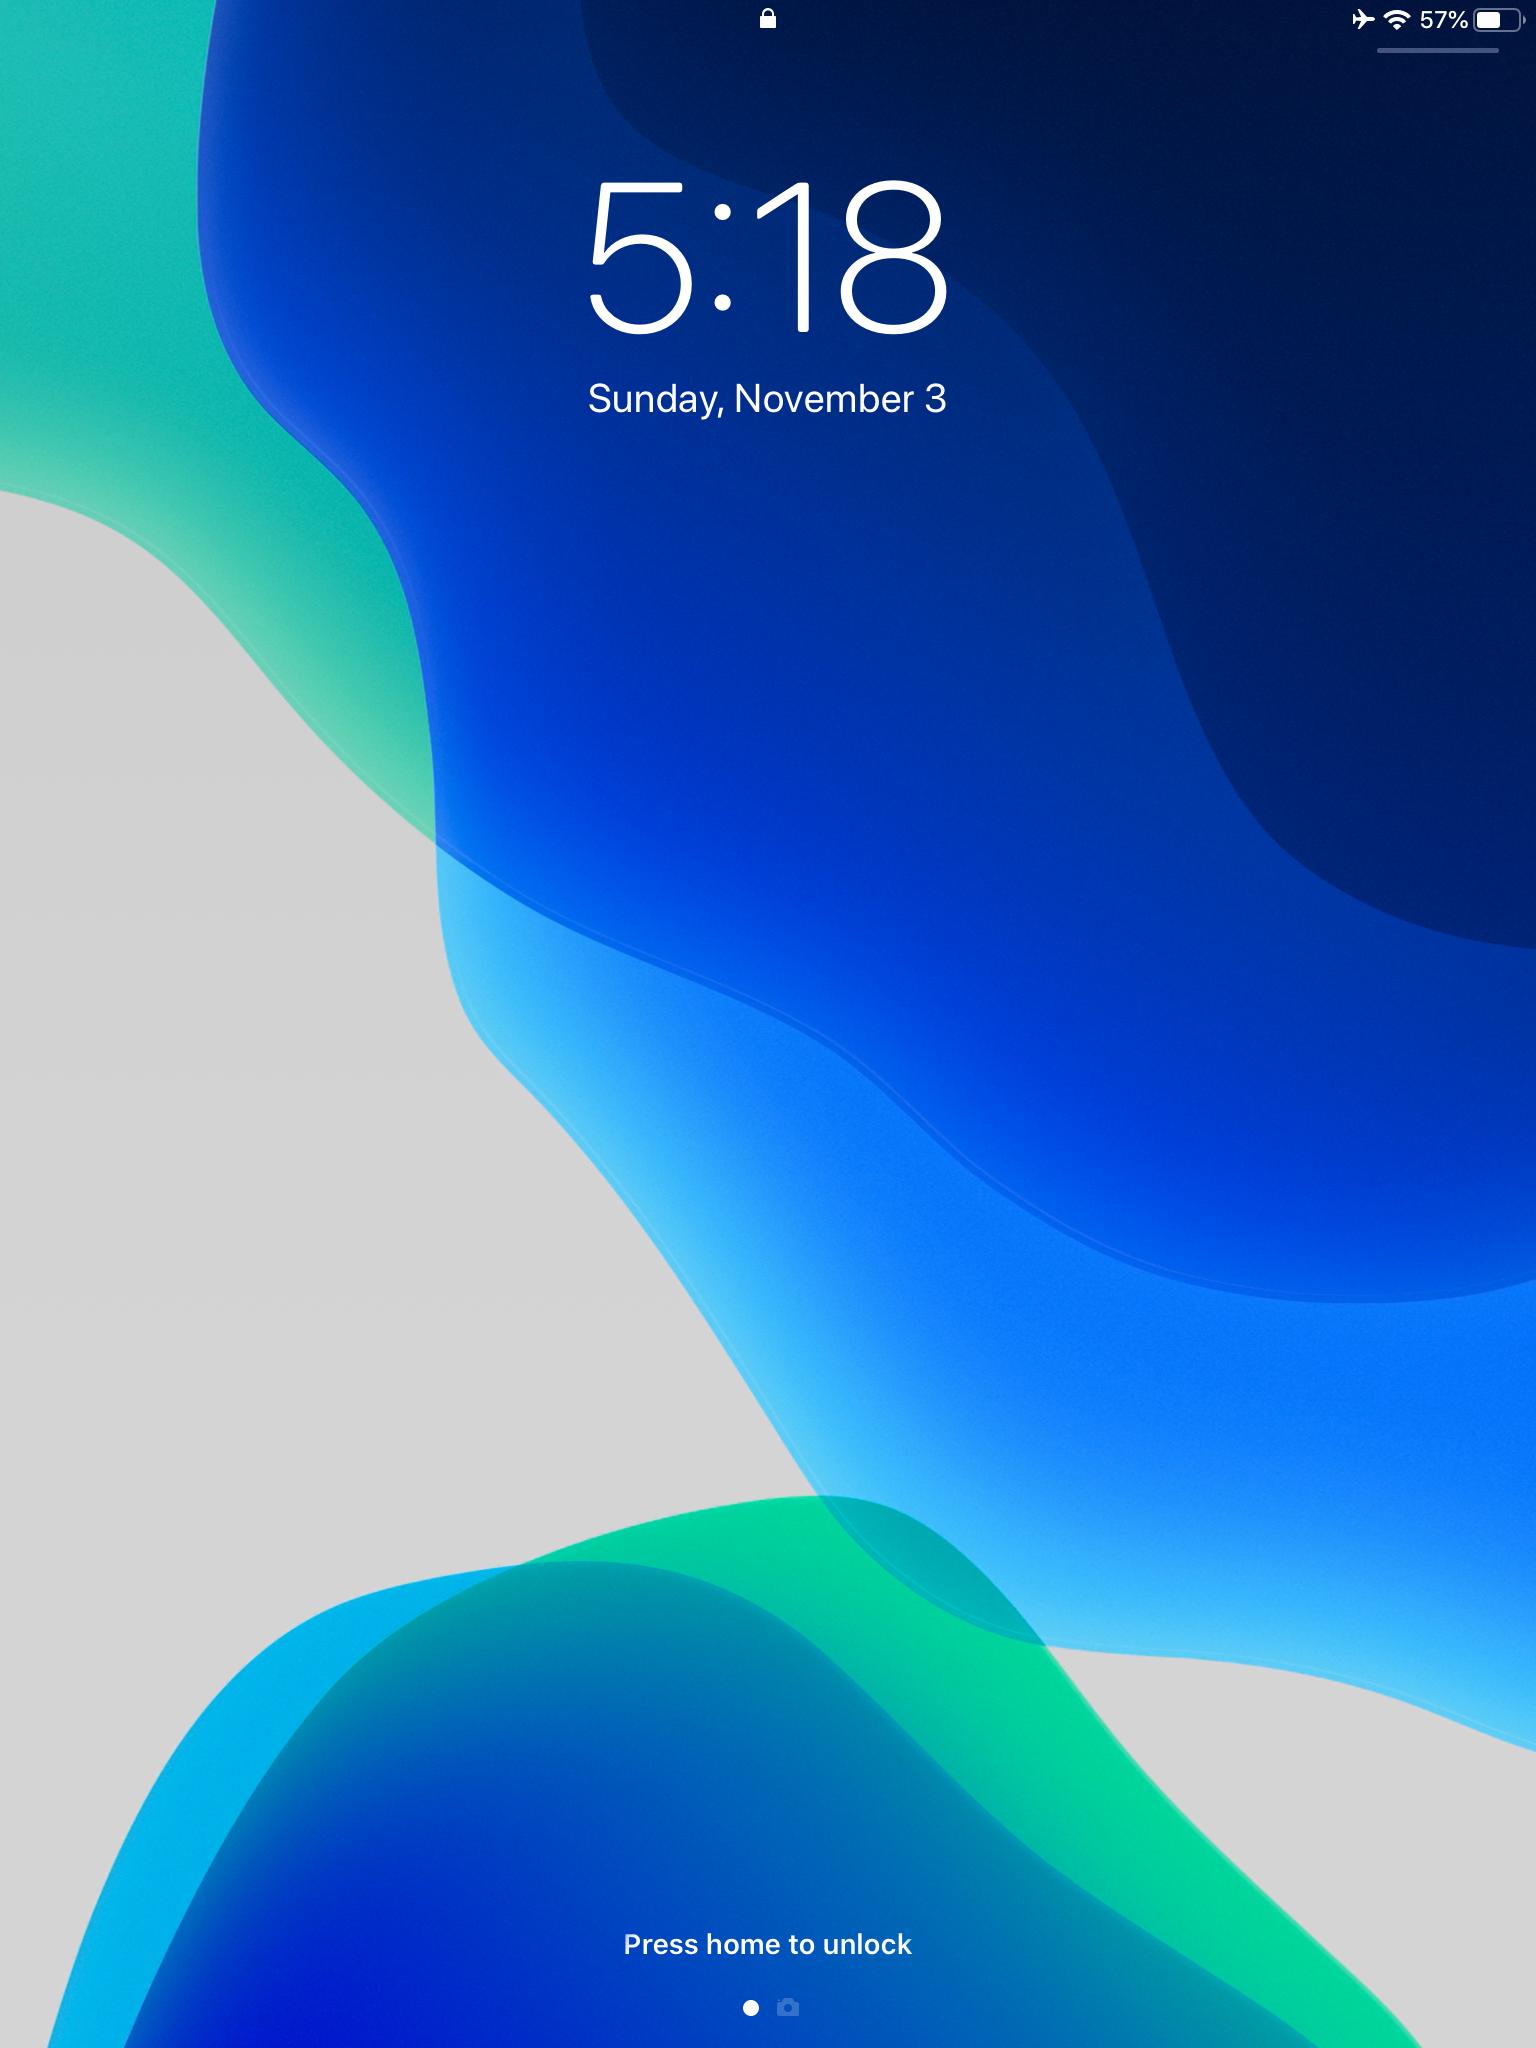 iOS 13 wallpaper #ios13wallpaper iOS 13 wallpaper #ios13wallpaper